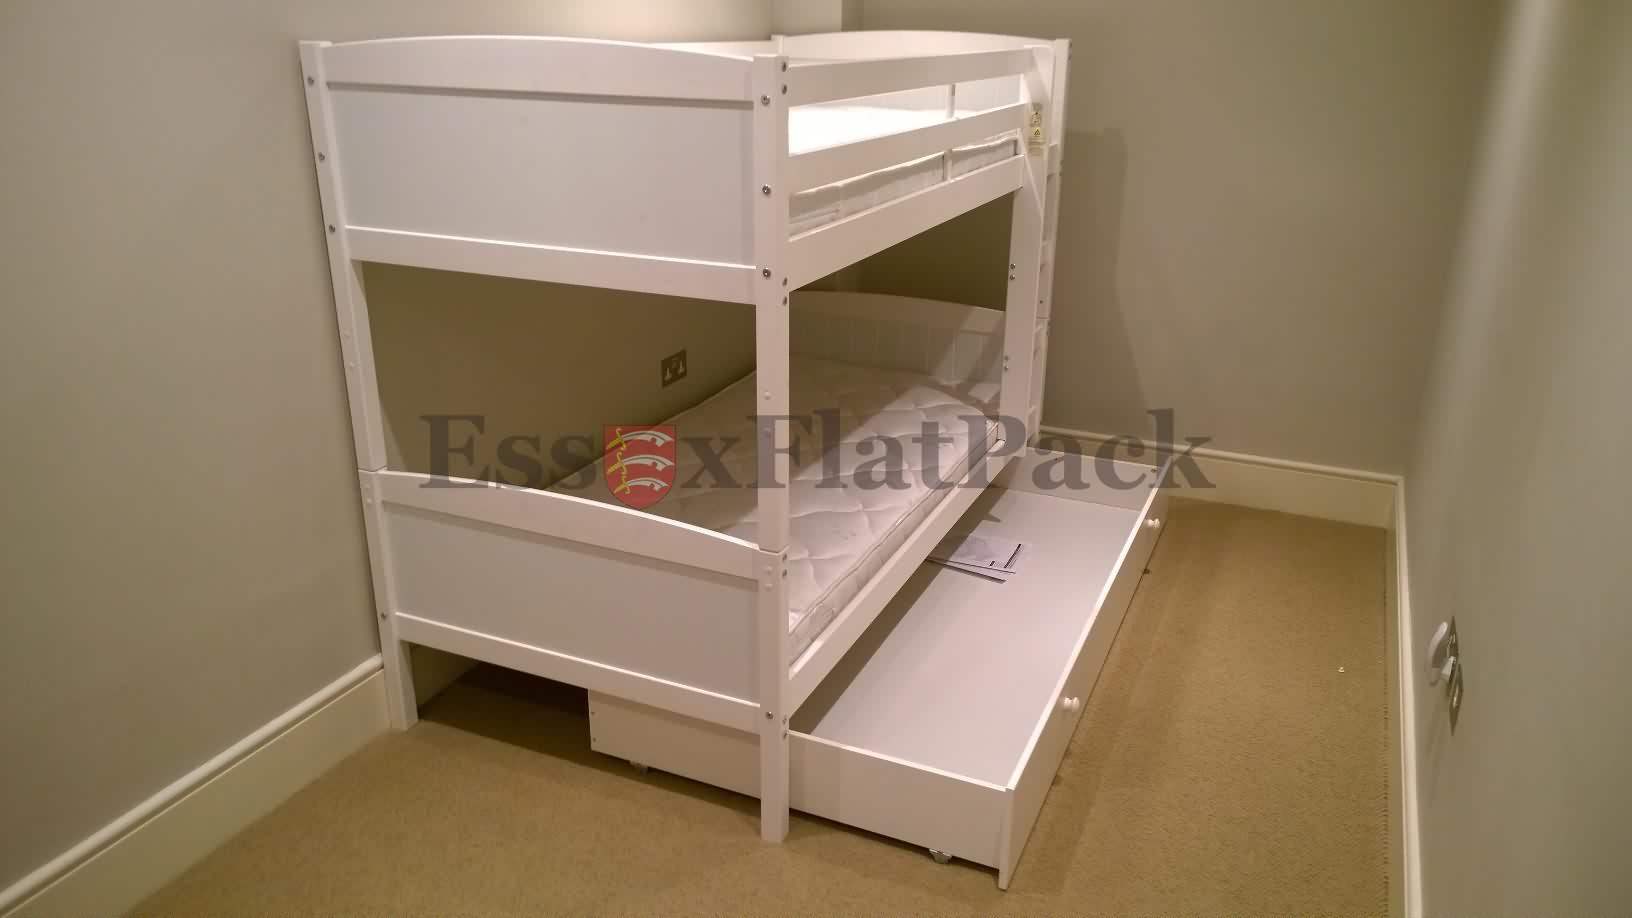 essexflatpack-cabin-bunks-20150610114915.jpg